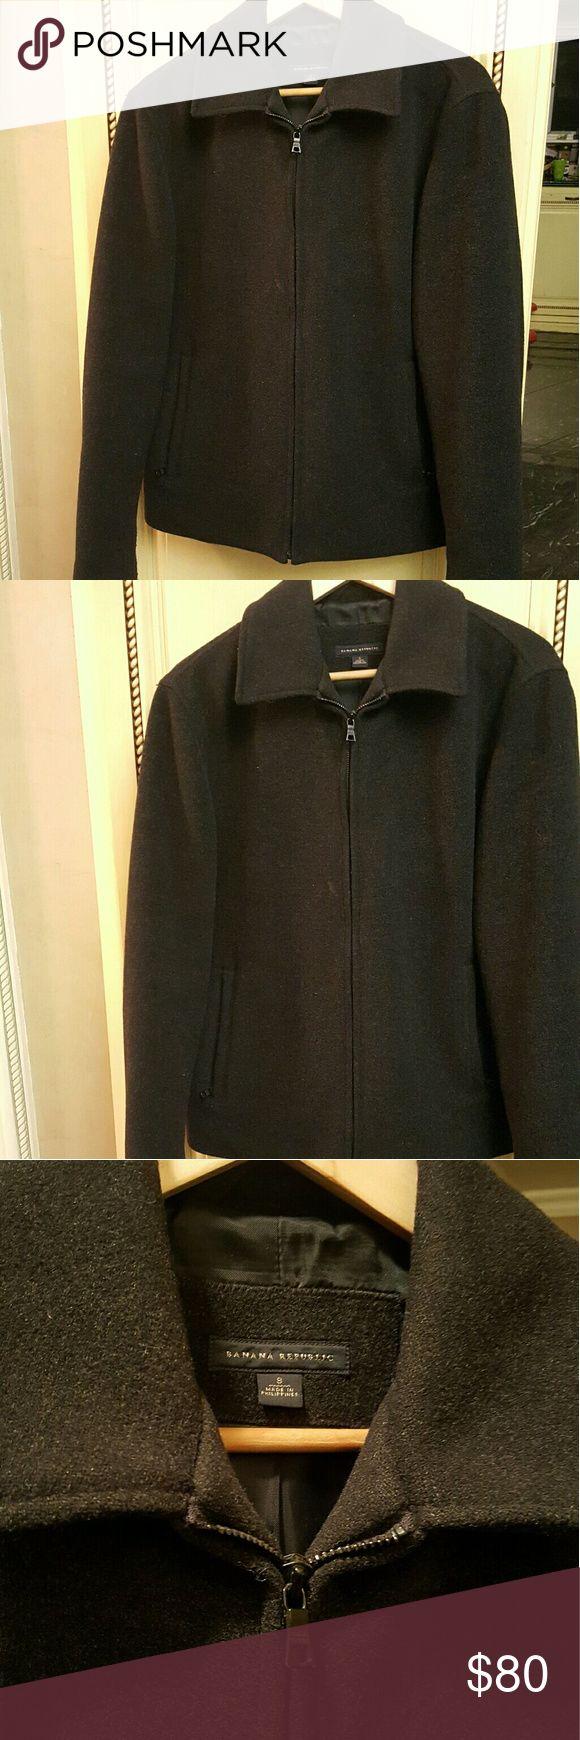 SALE! MENS- Banana Republic Pea coat Mens banana Republic Black Pea coat with 2 zippers pockets in great condition  **2-7bin (storage note to self) Banana Republic Jackets & Coats Pea Coats